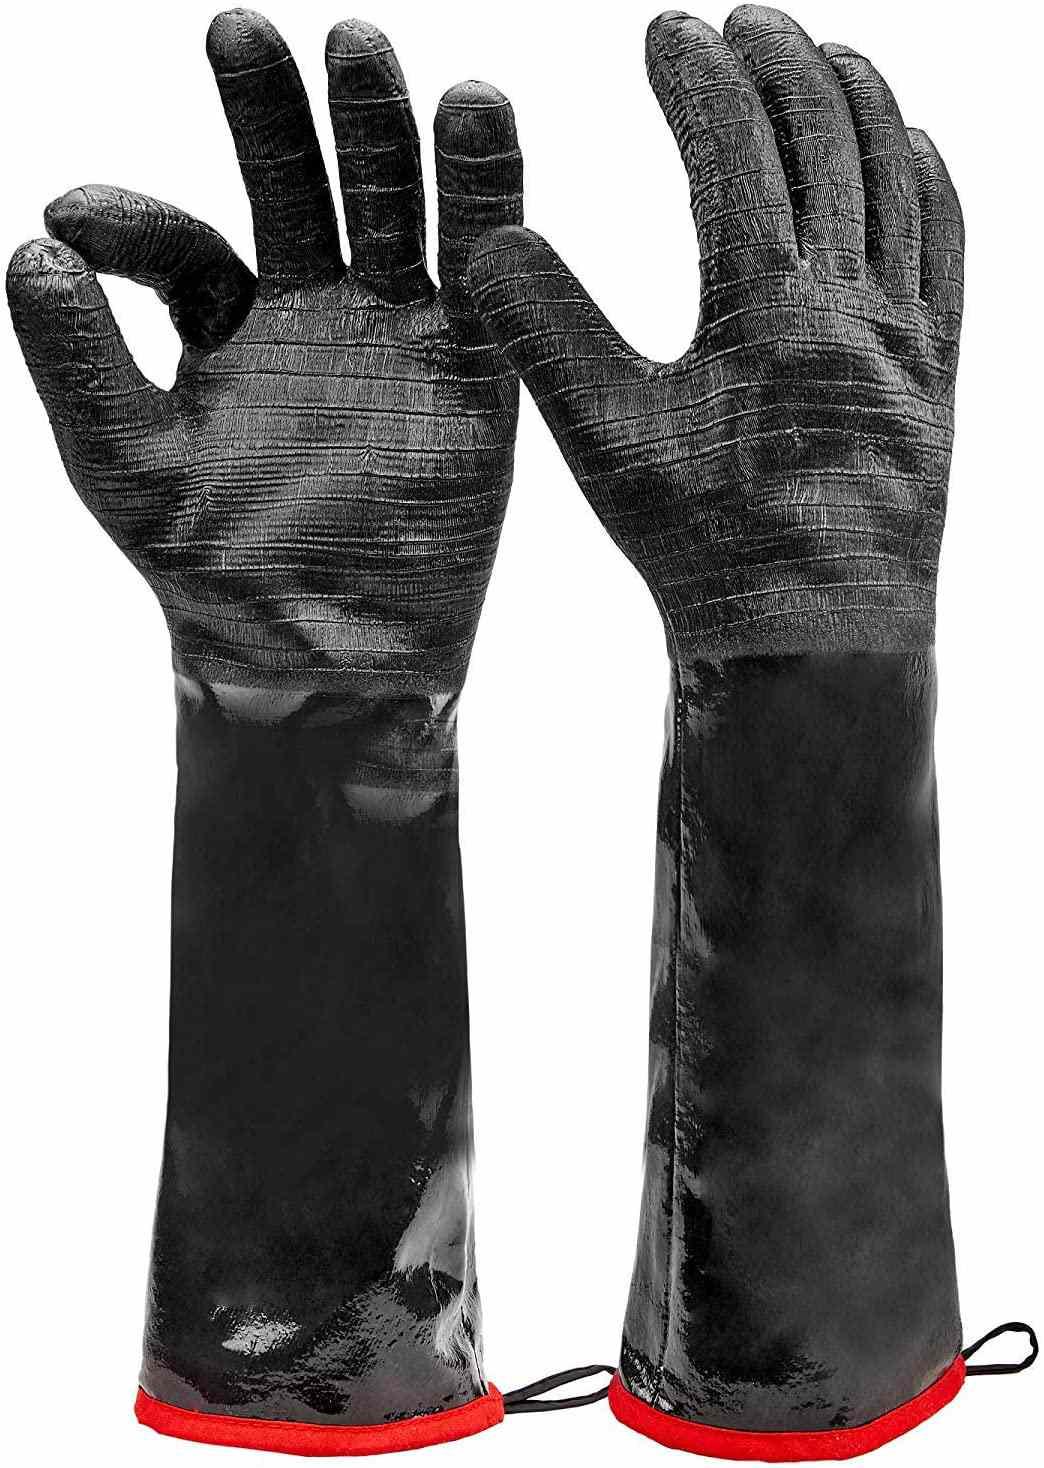 Heatsistence Long Sleeve Grill Gloves